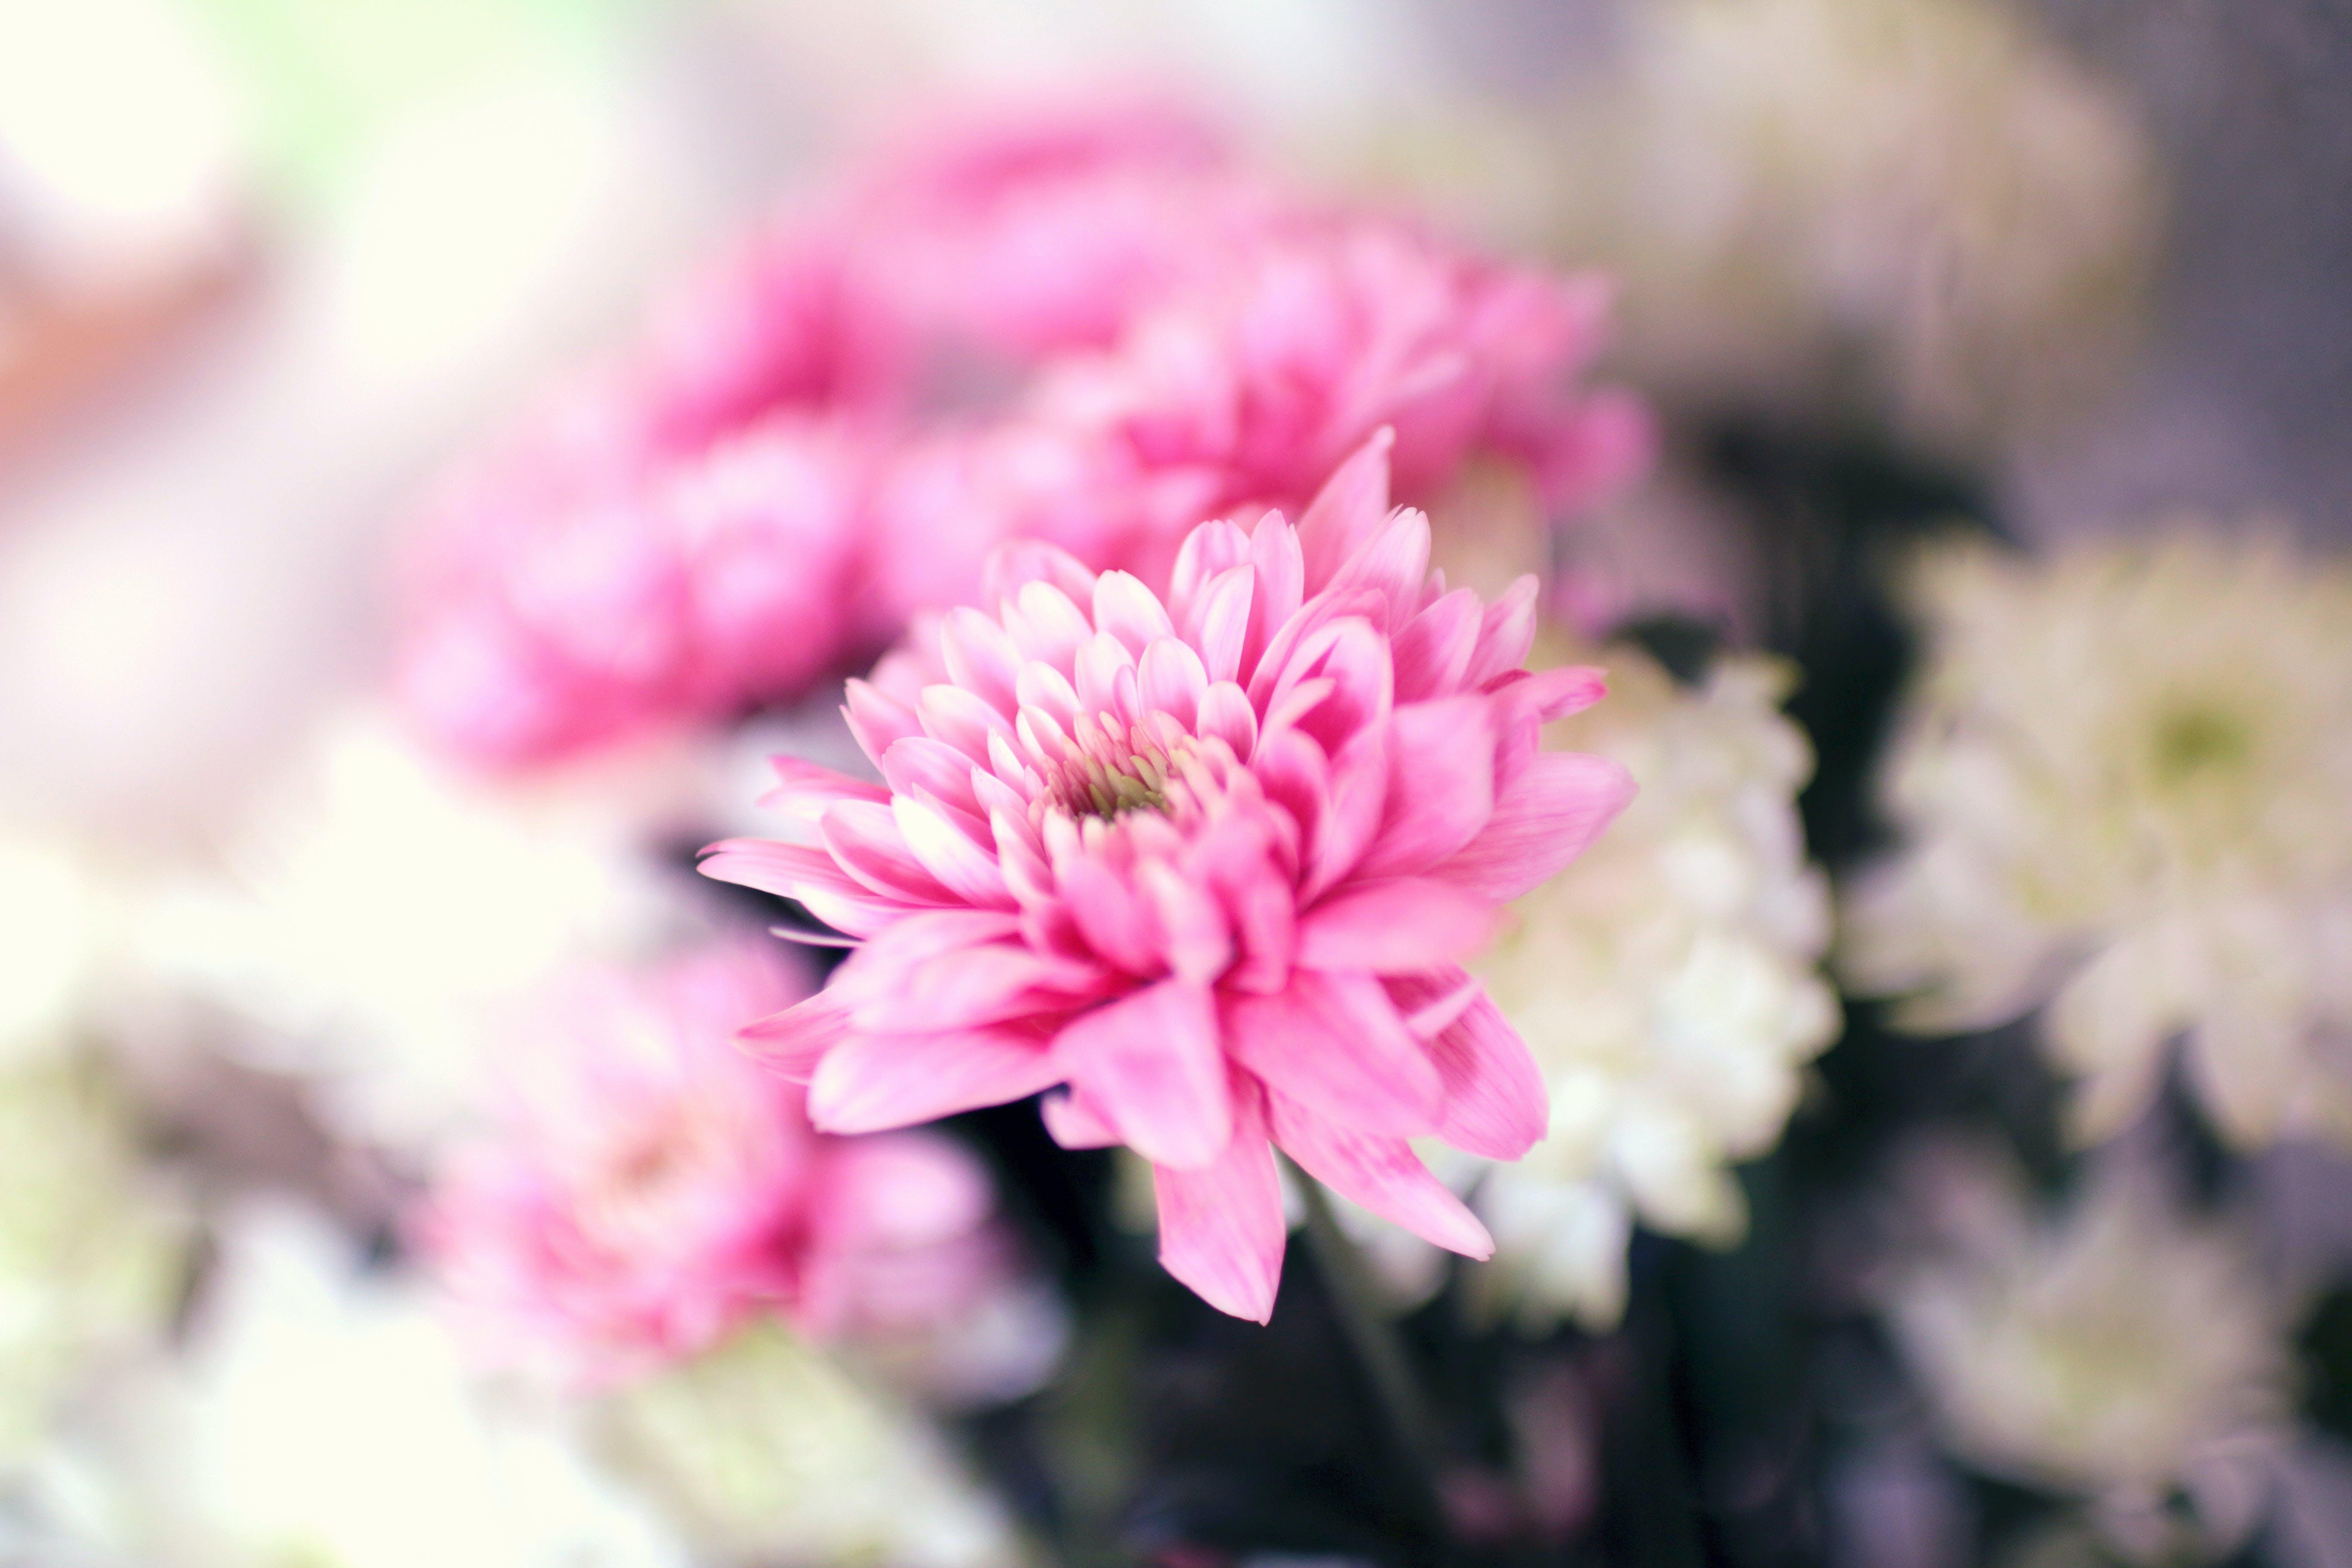 Selective Focus Photography of Pink Chrysanthemum Flower